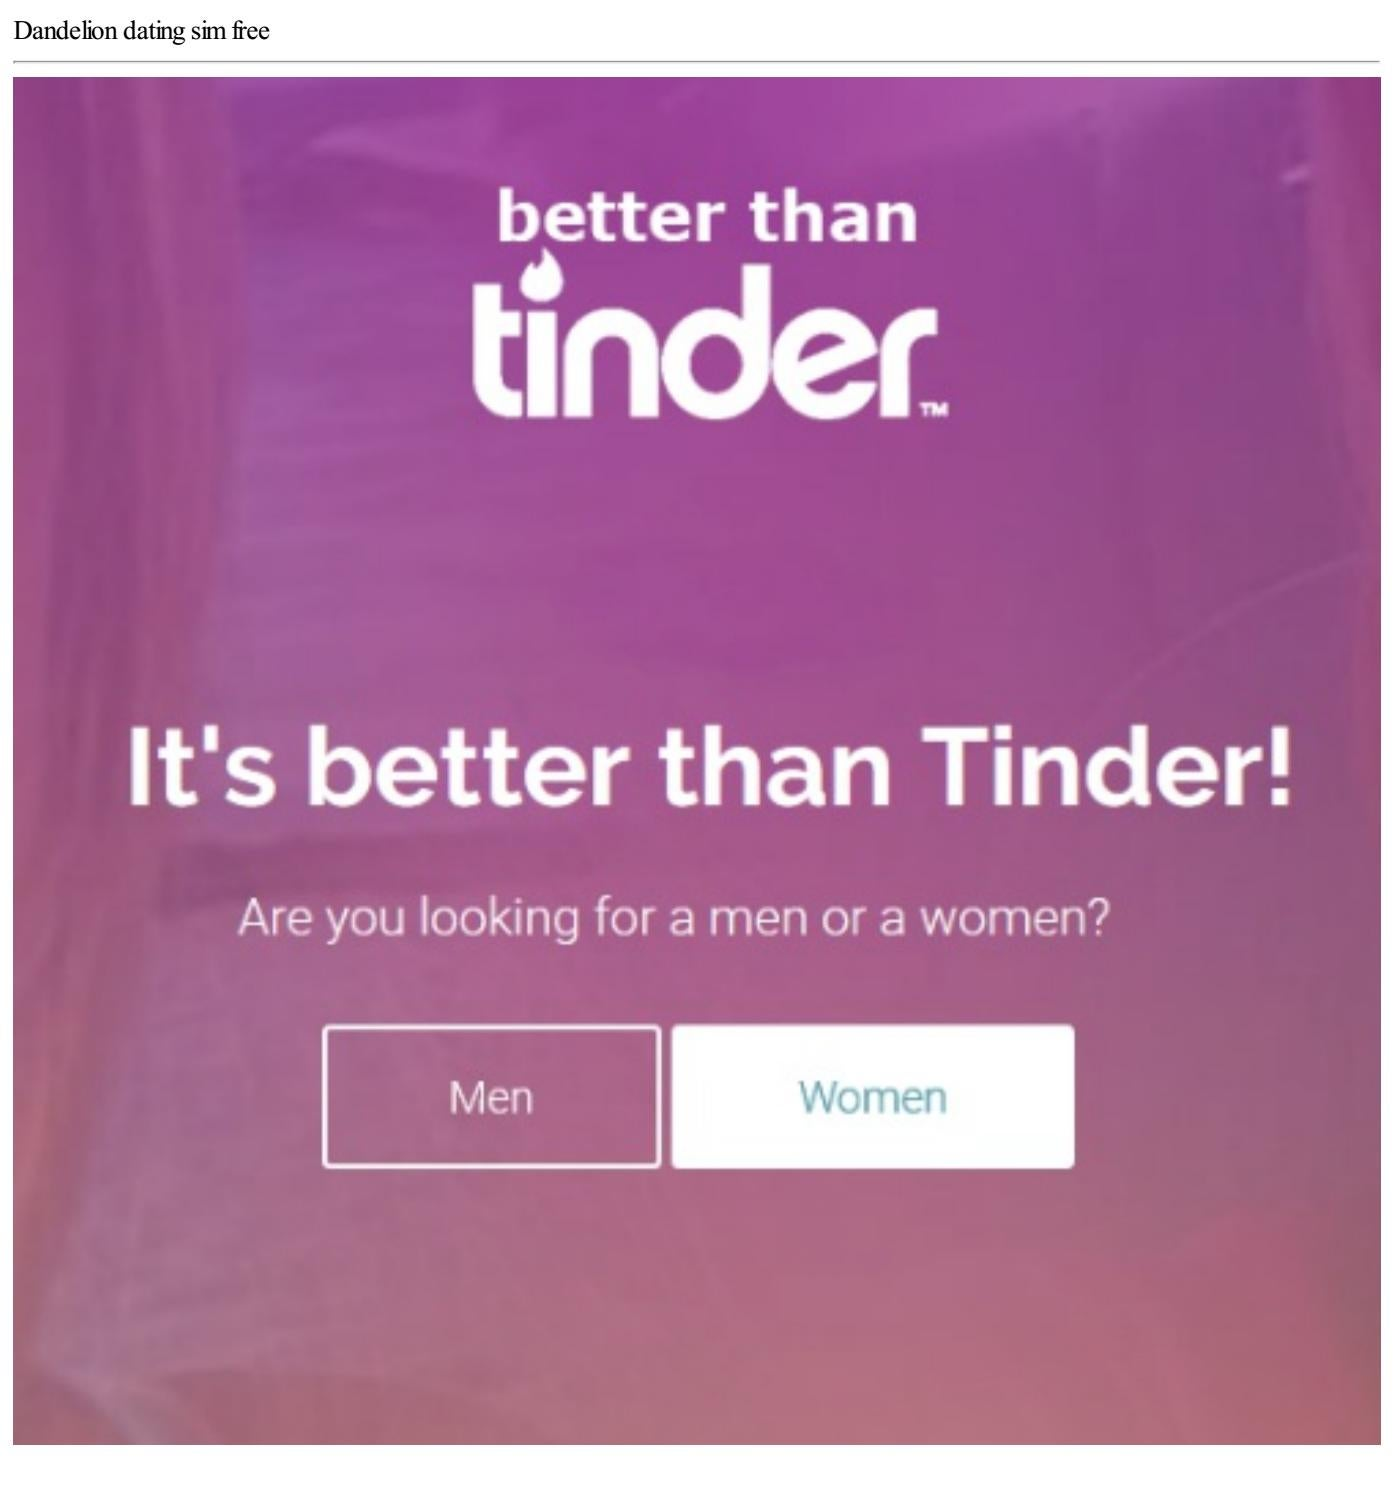 Dandelion dating sim free